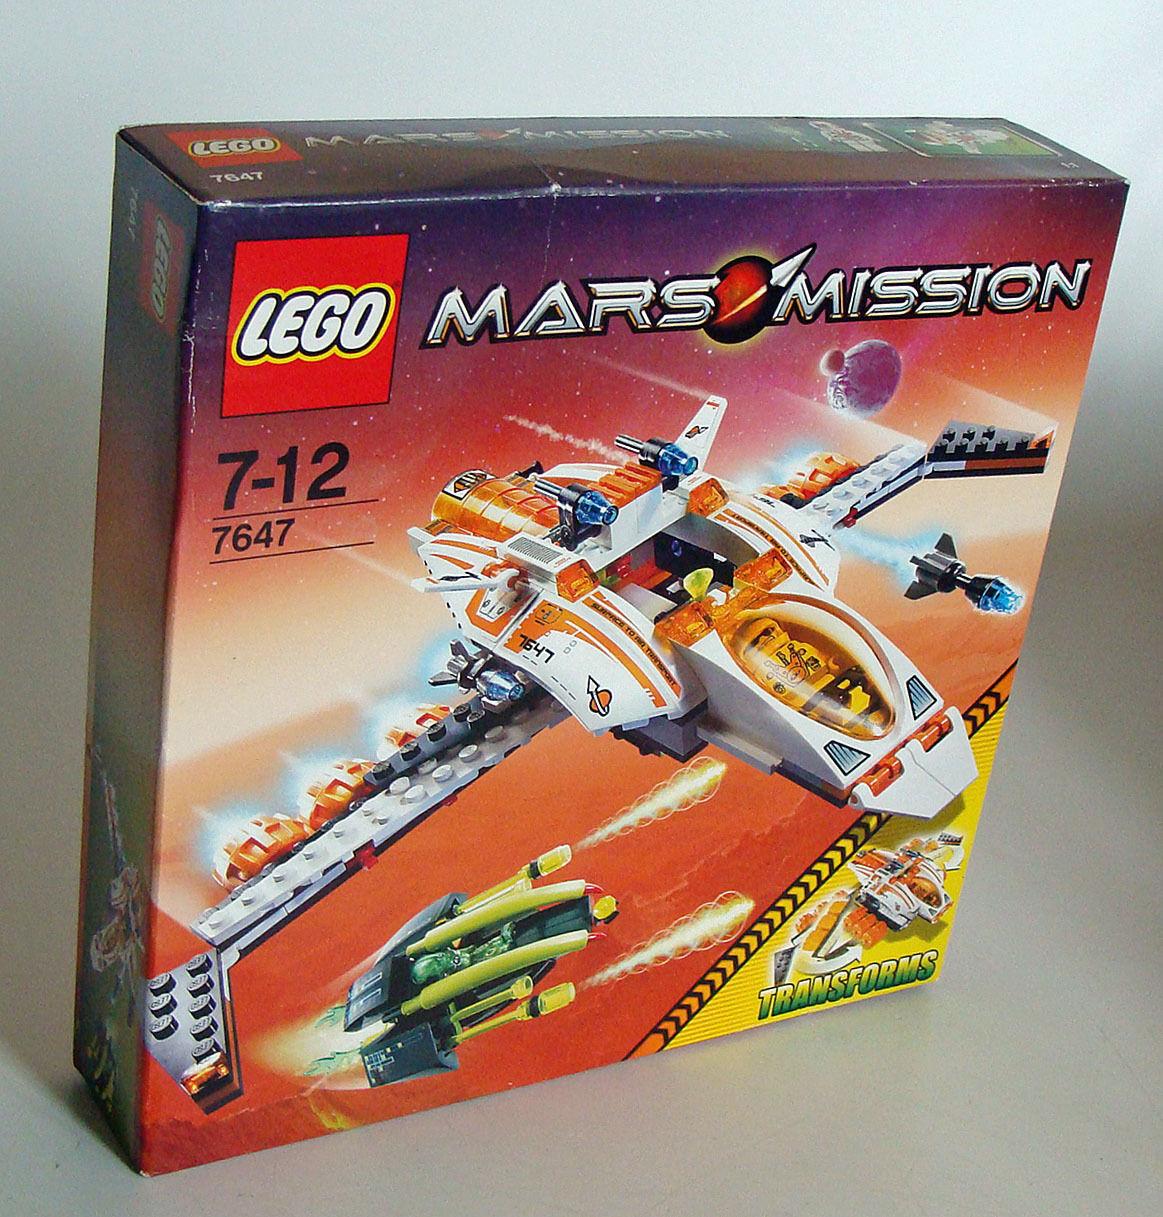 Lego® Mars Mission 7647 - MX-41 Switch Fighter 235 Teile Teile Teile 7-12 Jahren - Neu 5bf8c3